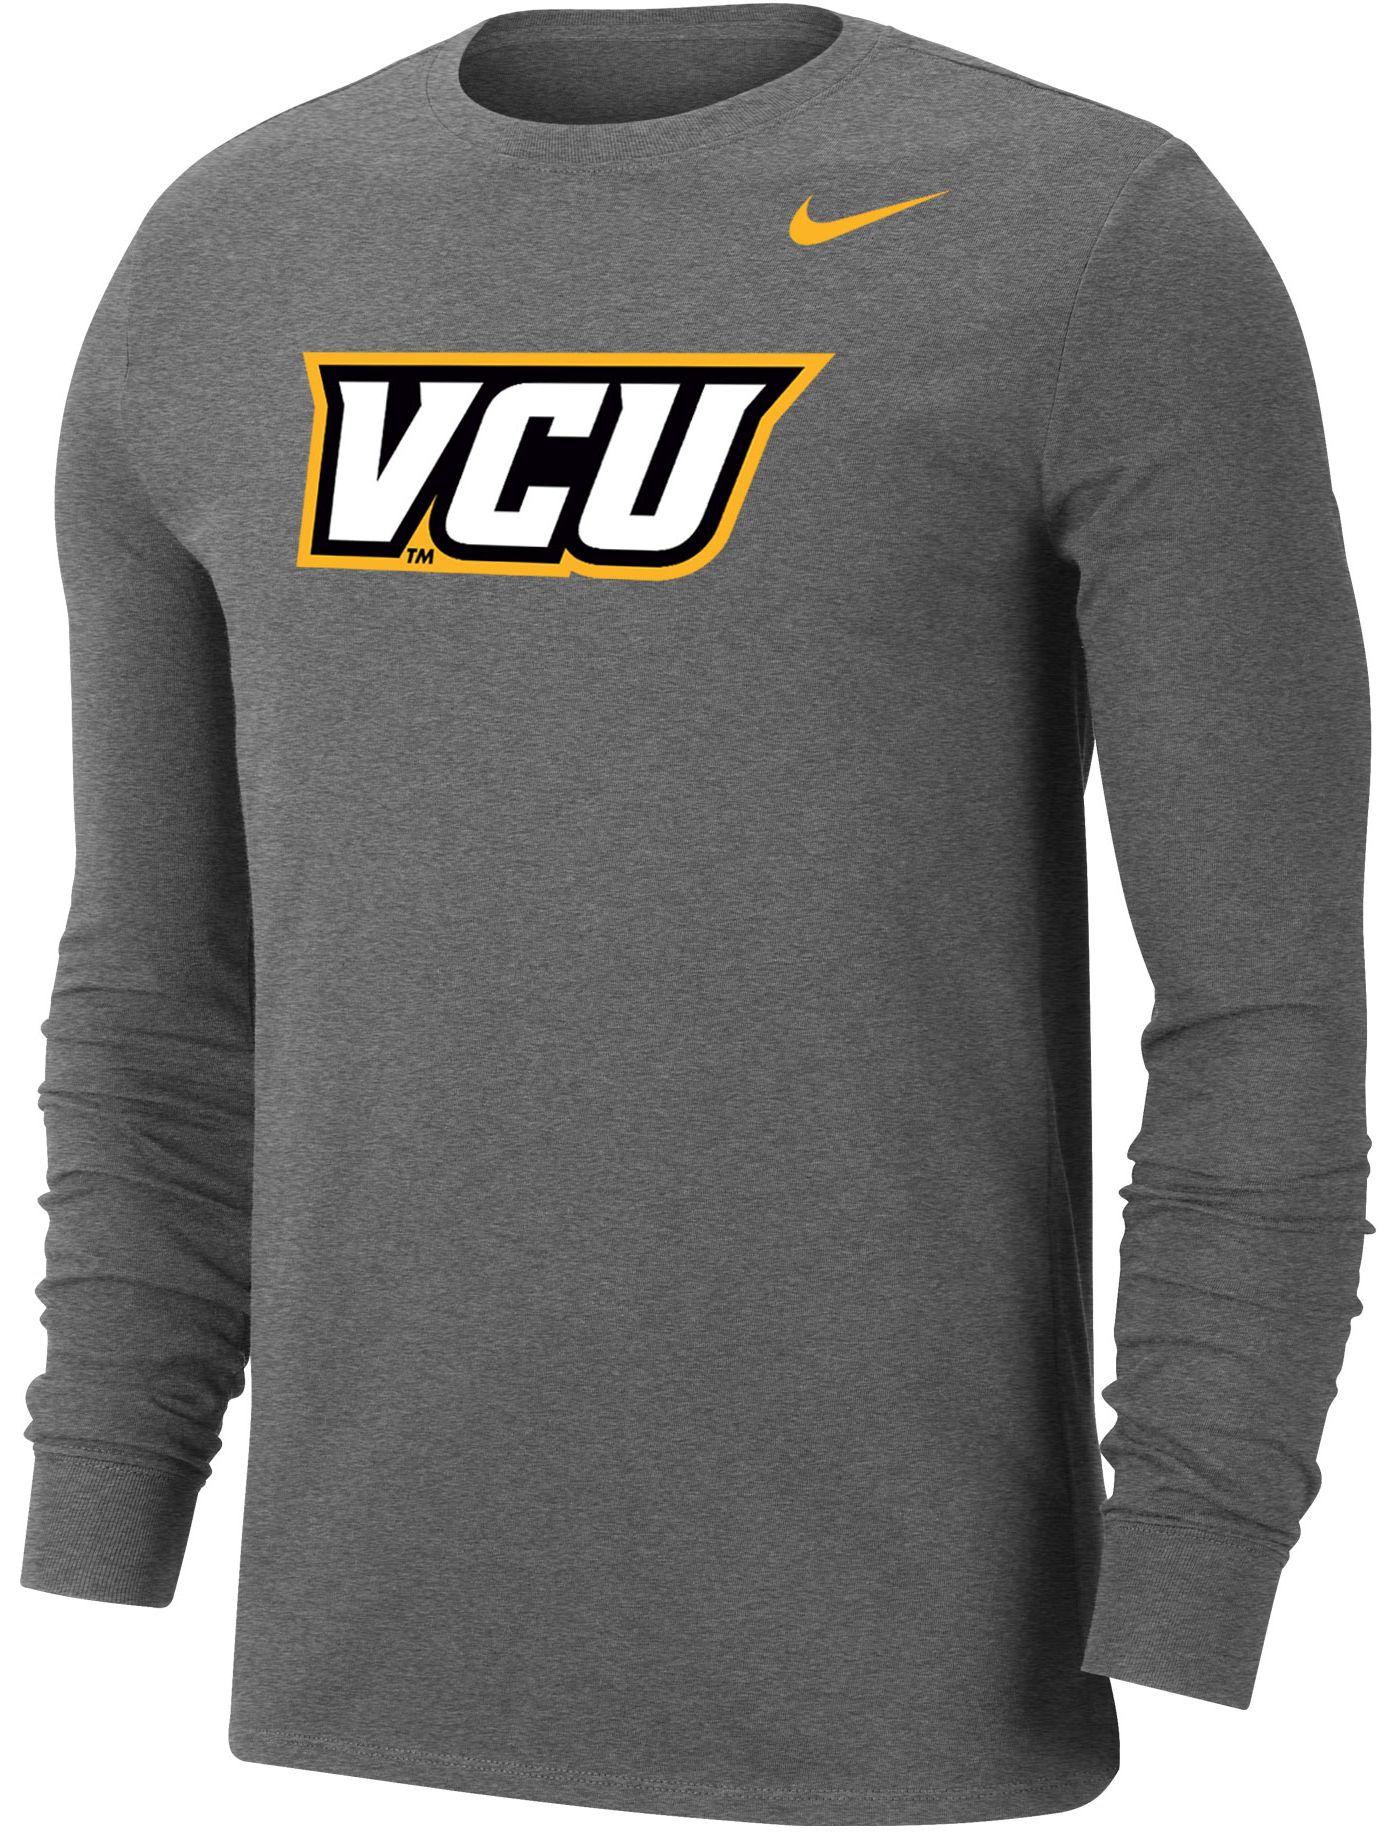 Nike Men's VCU Rams Grey Wordmark Long Sleeve T-Shirt